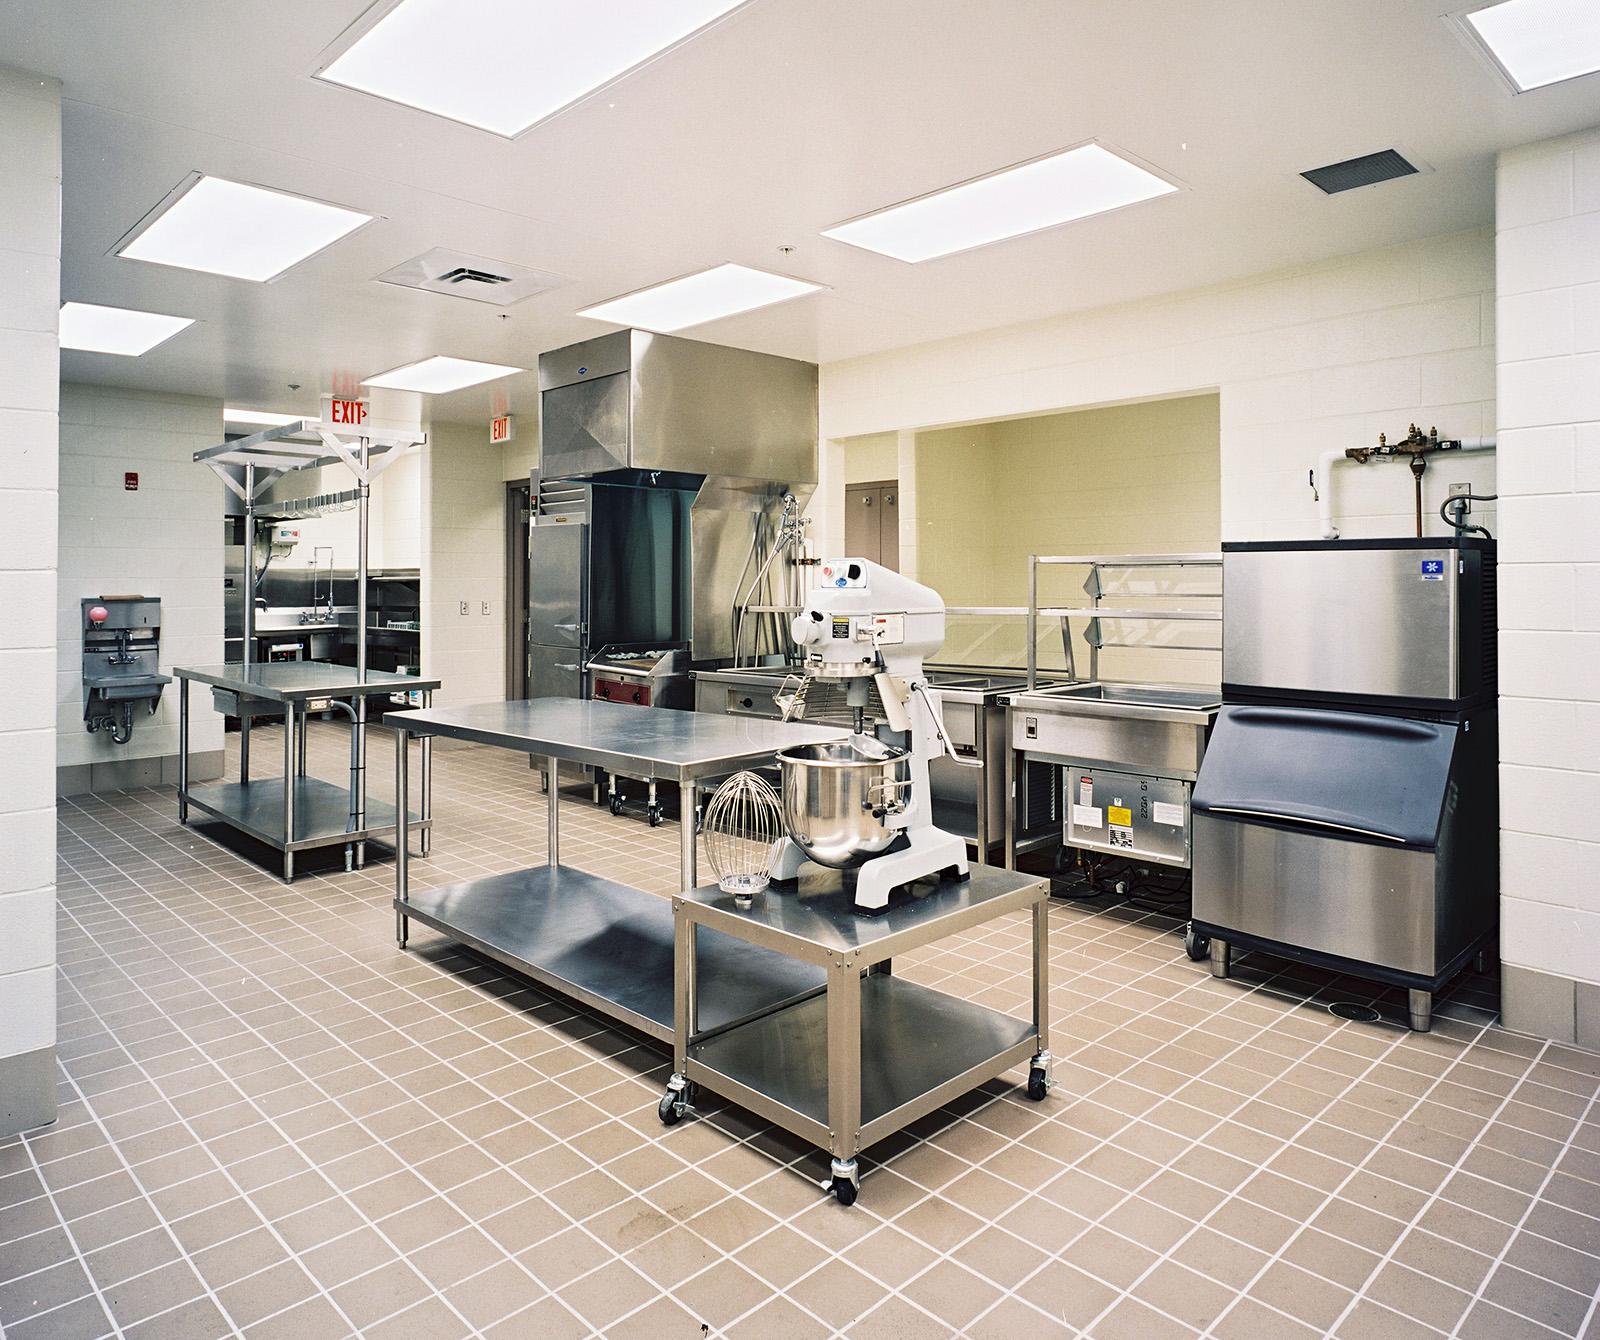 mi-dmva-joint-forces-hq-kitchen